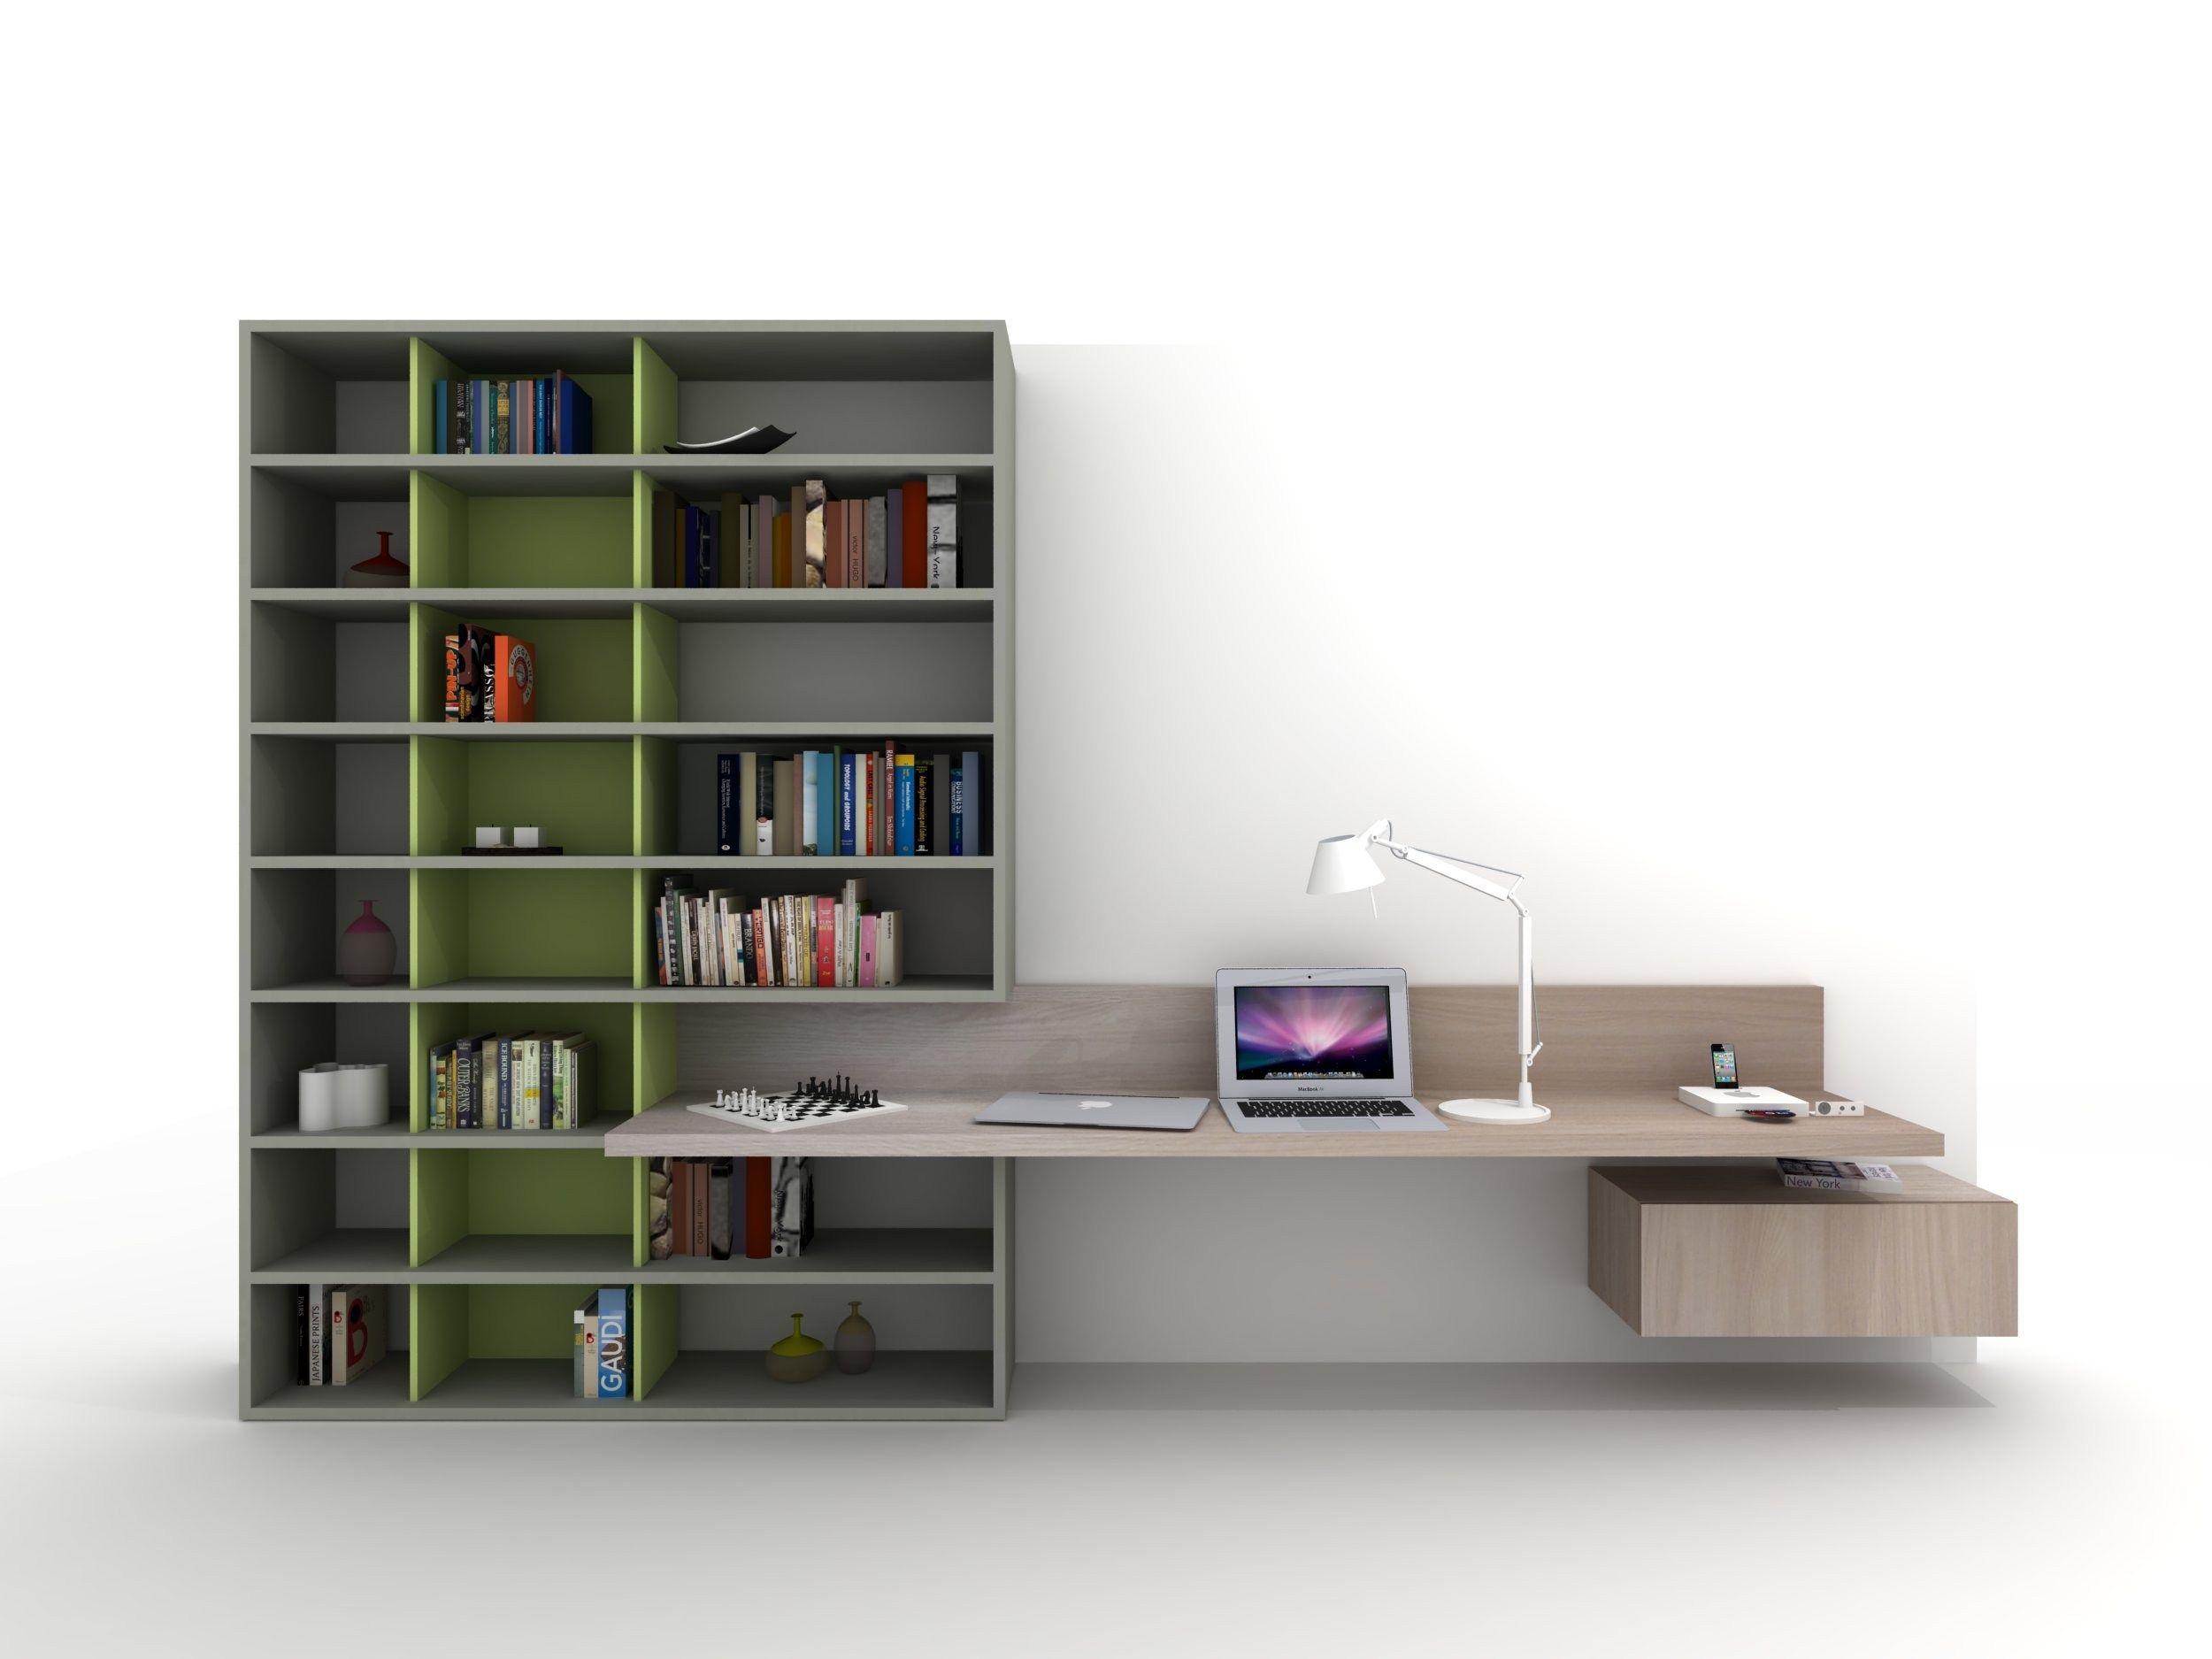 Escritorio con estanter a para habitaciones de ni os z410 - Estanterias para escritorios ...